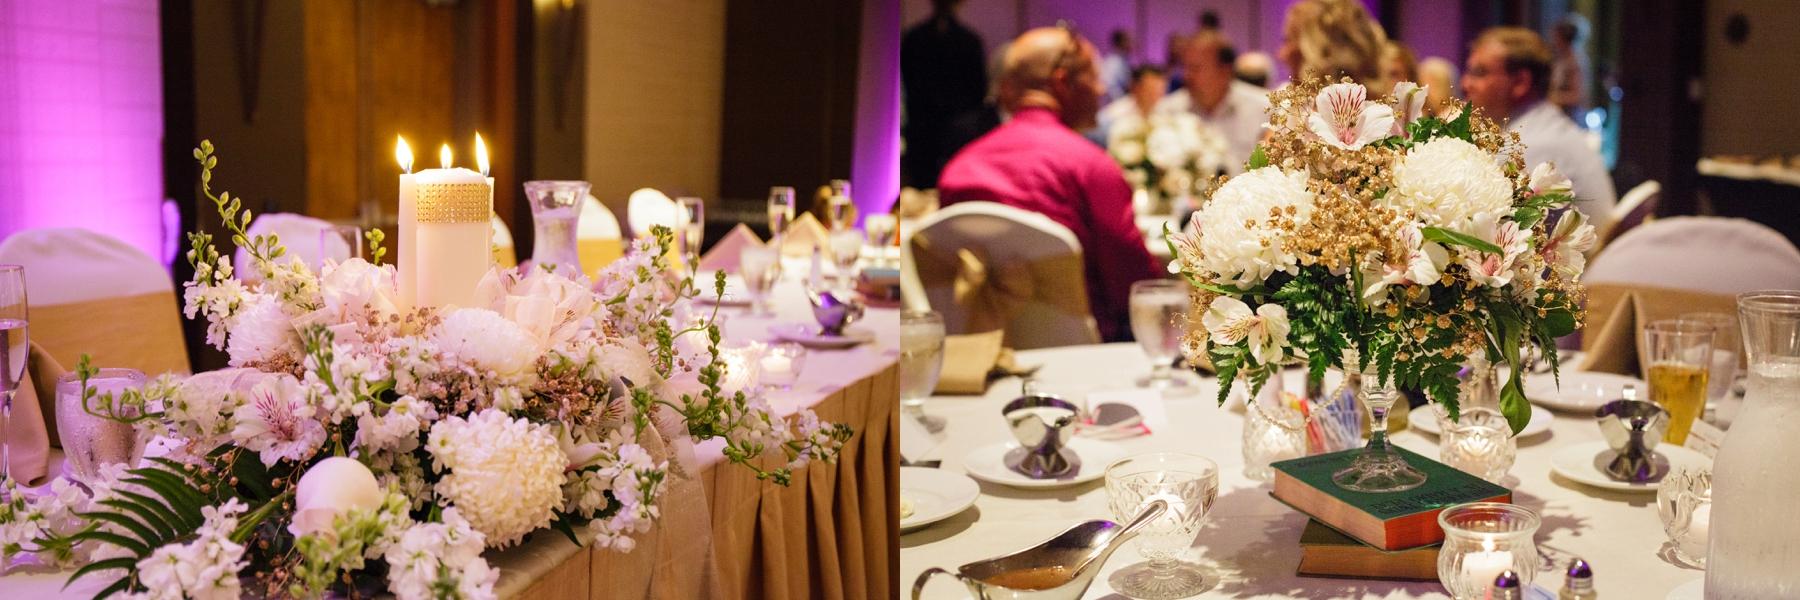 Ben_Jillian_Midland_Baycity_Wedding_0067.jpg